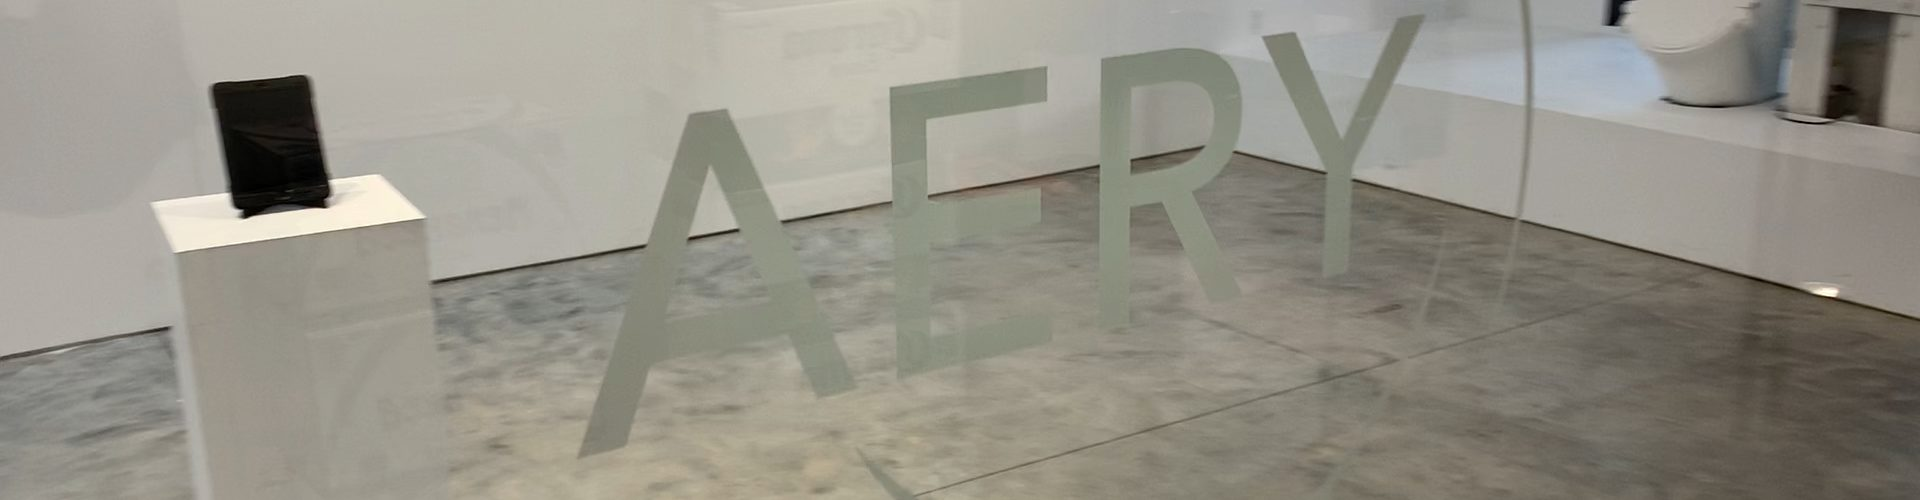 AERY FINE ART APP